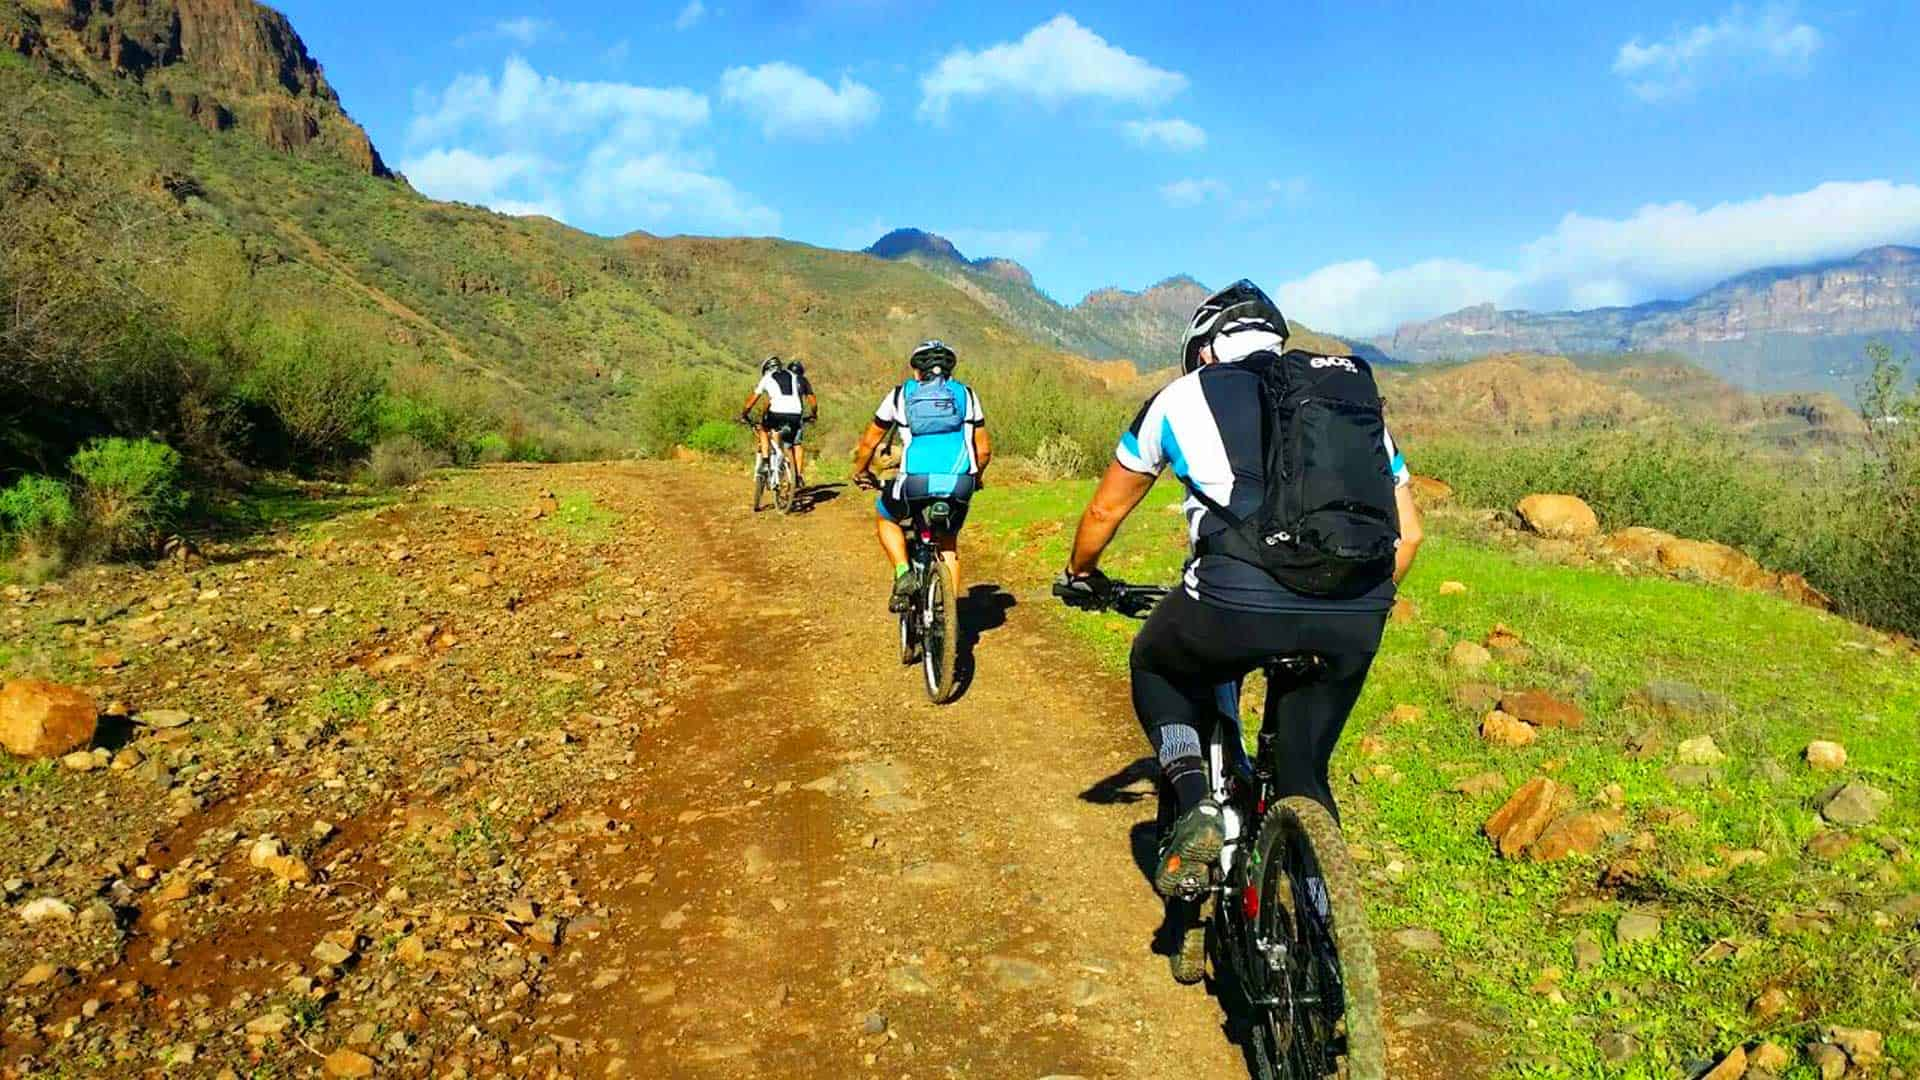 Gran Canaria Mountain Bike - Volcanic South 1 day tour